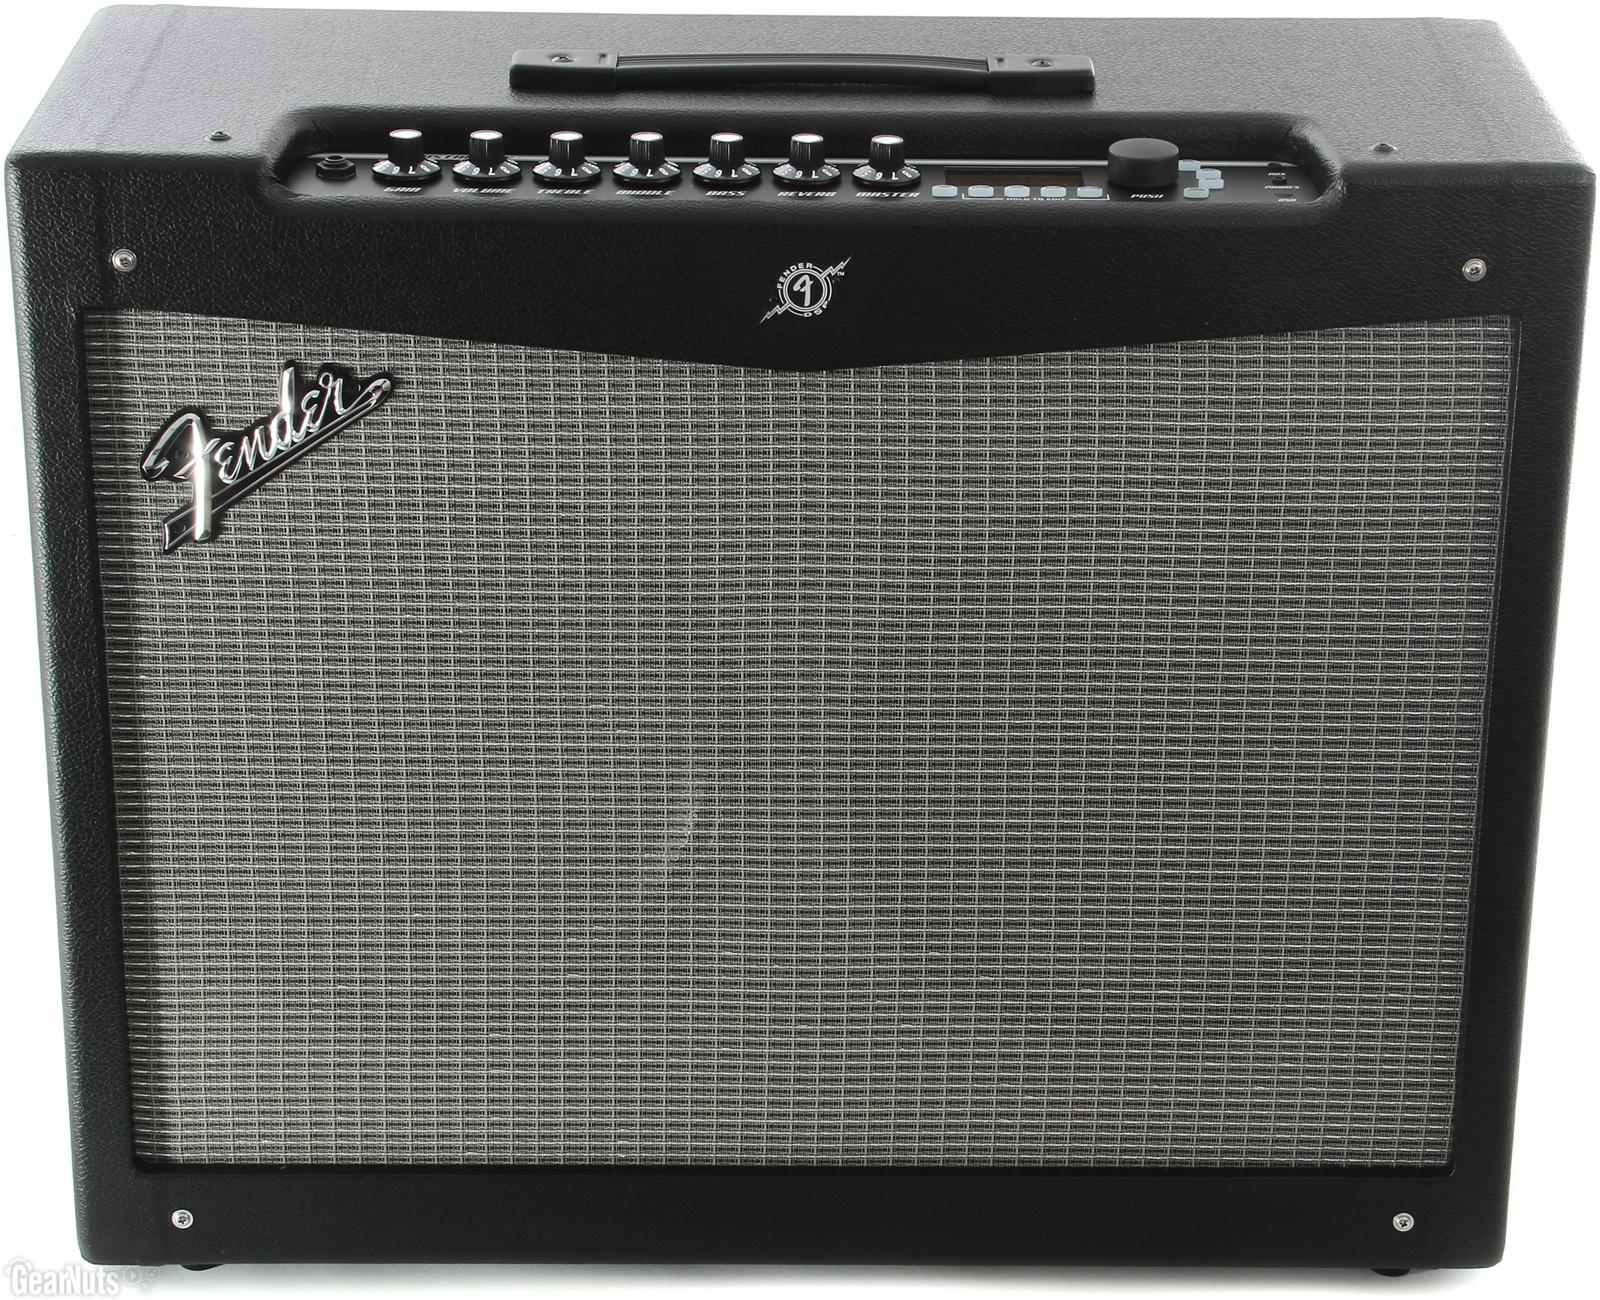 fender mustang iv v 2 image 1704123 audiofanzine rh en audiofanzine com fender mustang iv v2 manual pdf Fender Mustang IV V.2